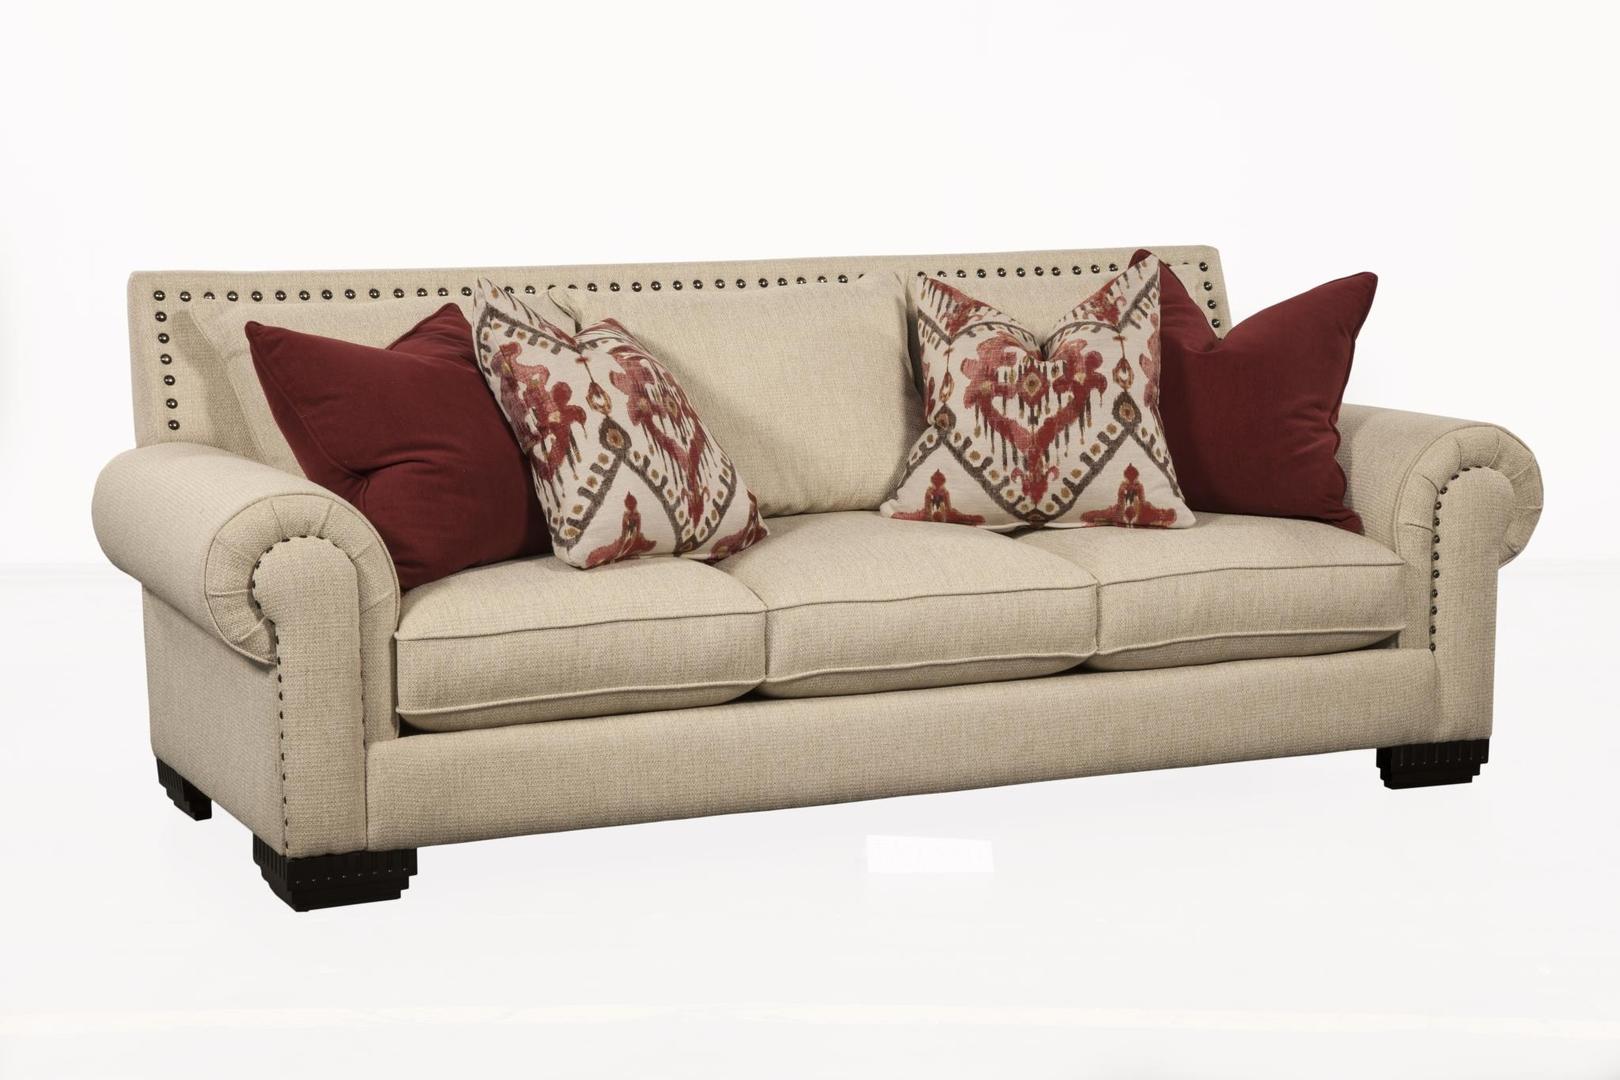 Furniture Robert Michael Furniture Sectional Robert Michaels For Down Filled Sectional Sofas (View 13 of 15)